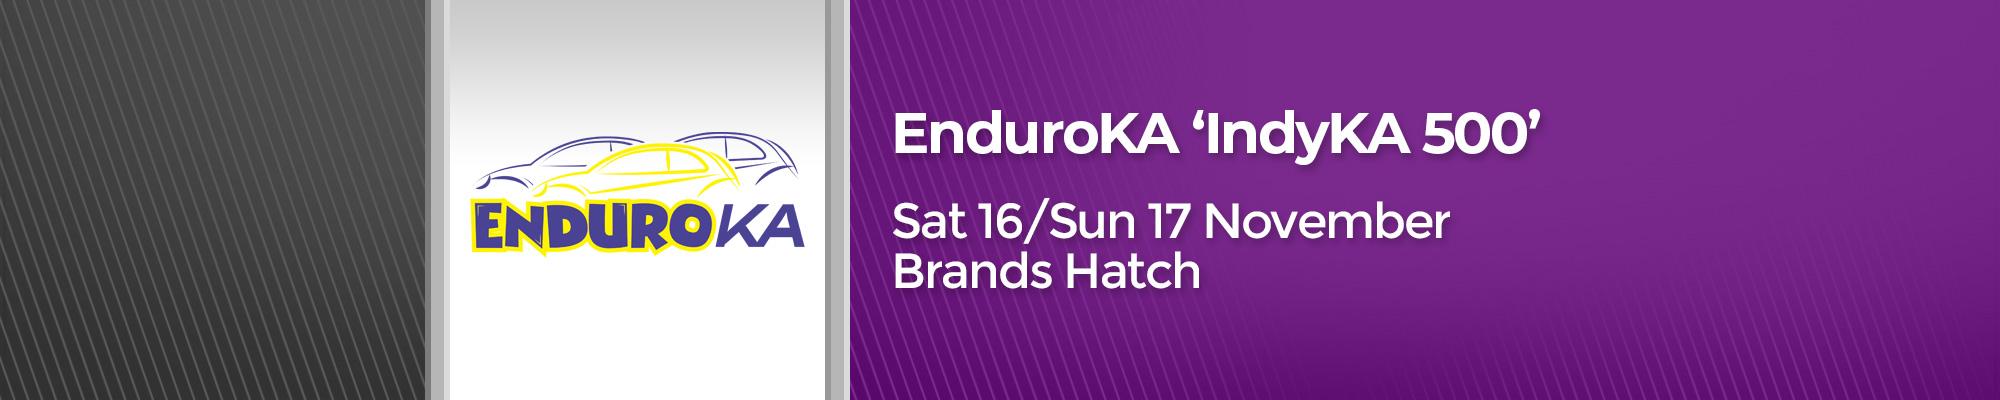 EnduroKA 'IndyKa 500'